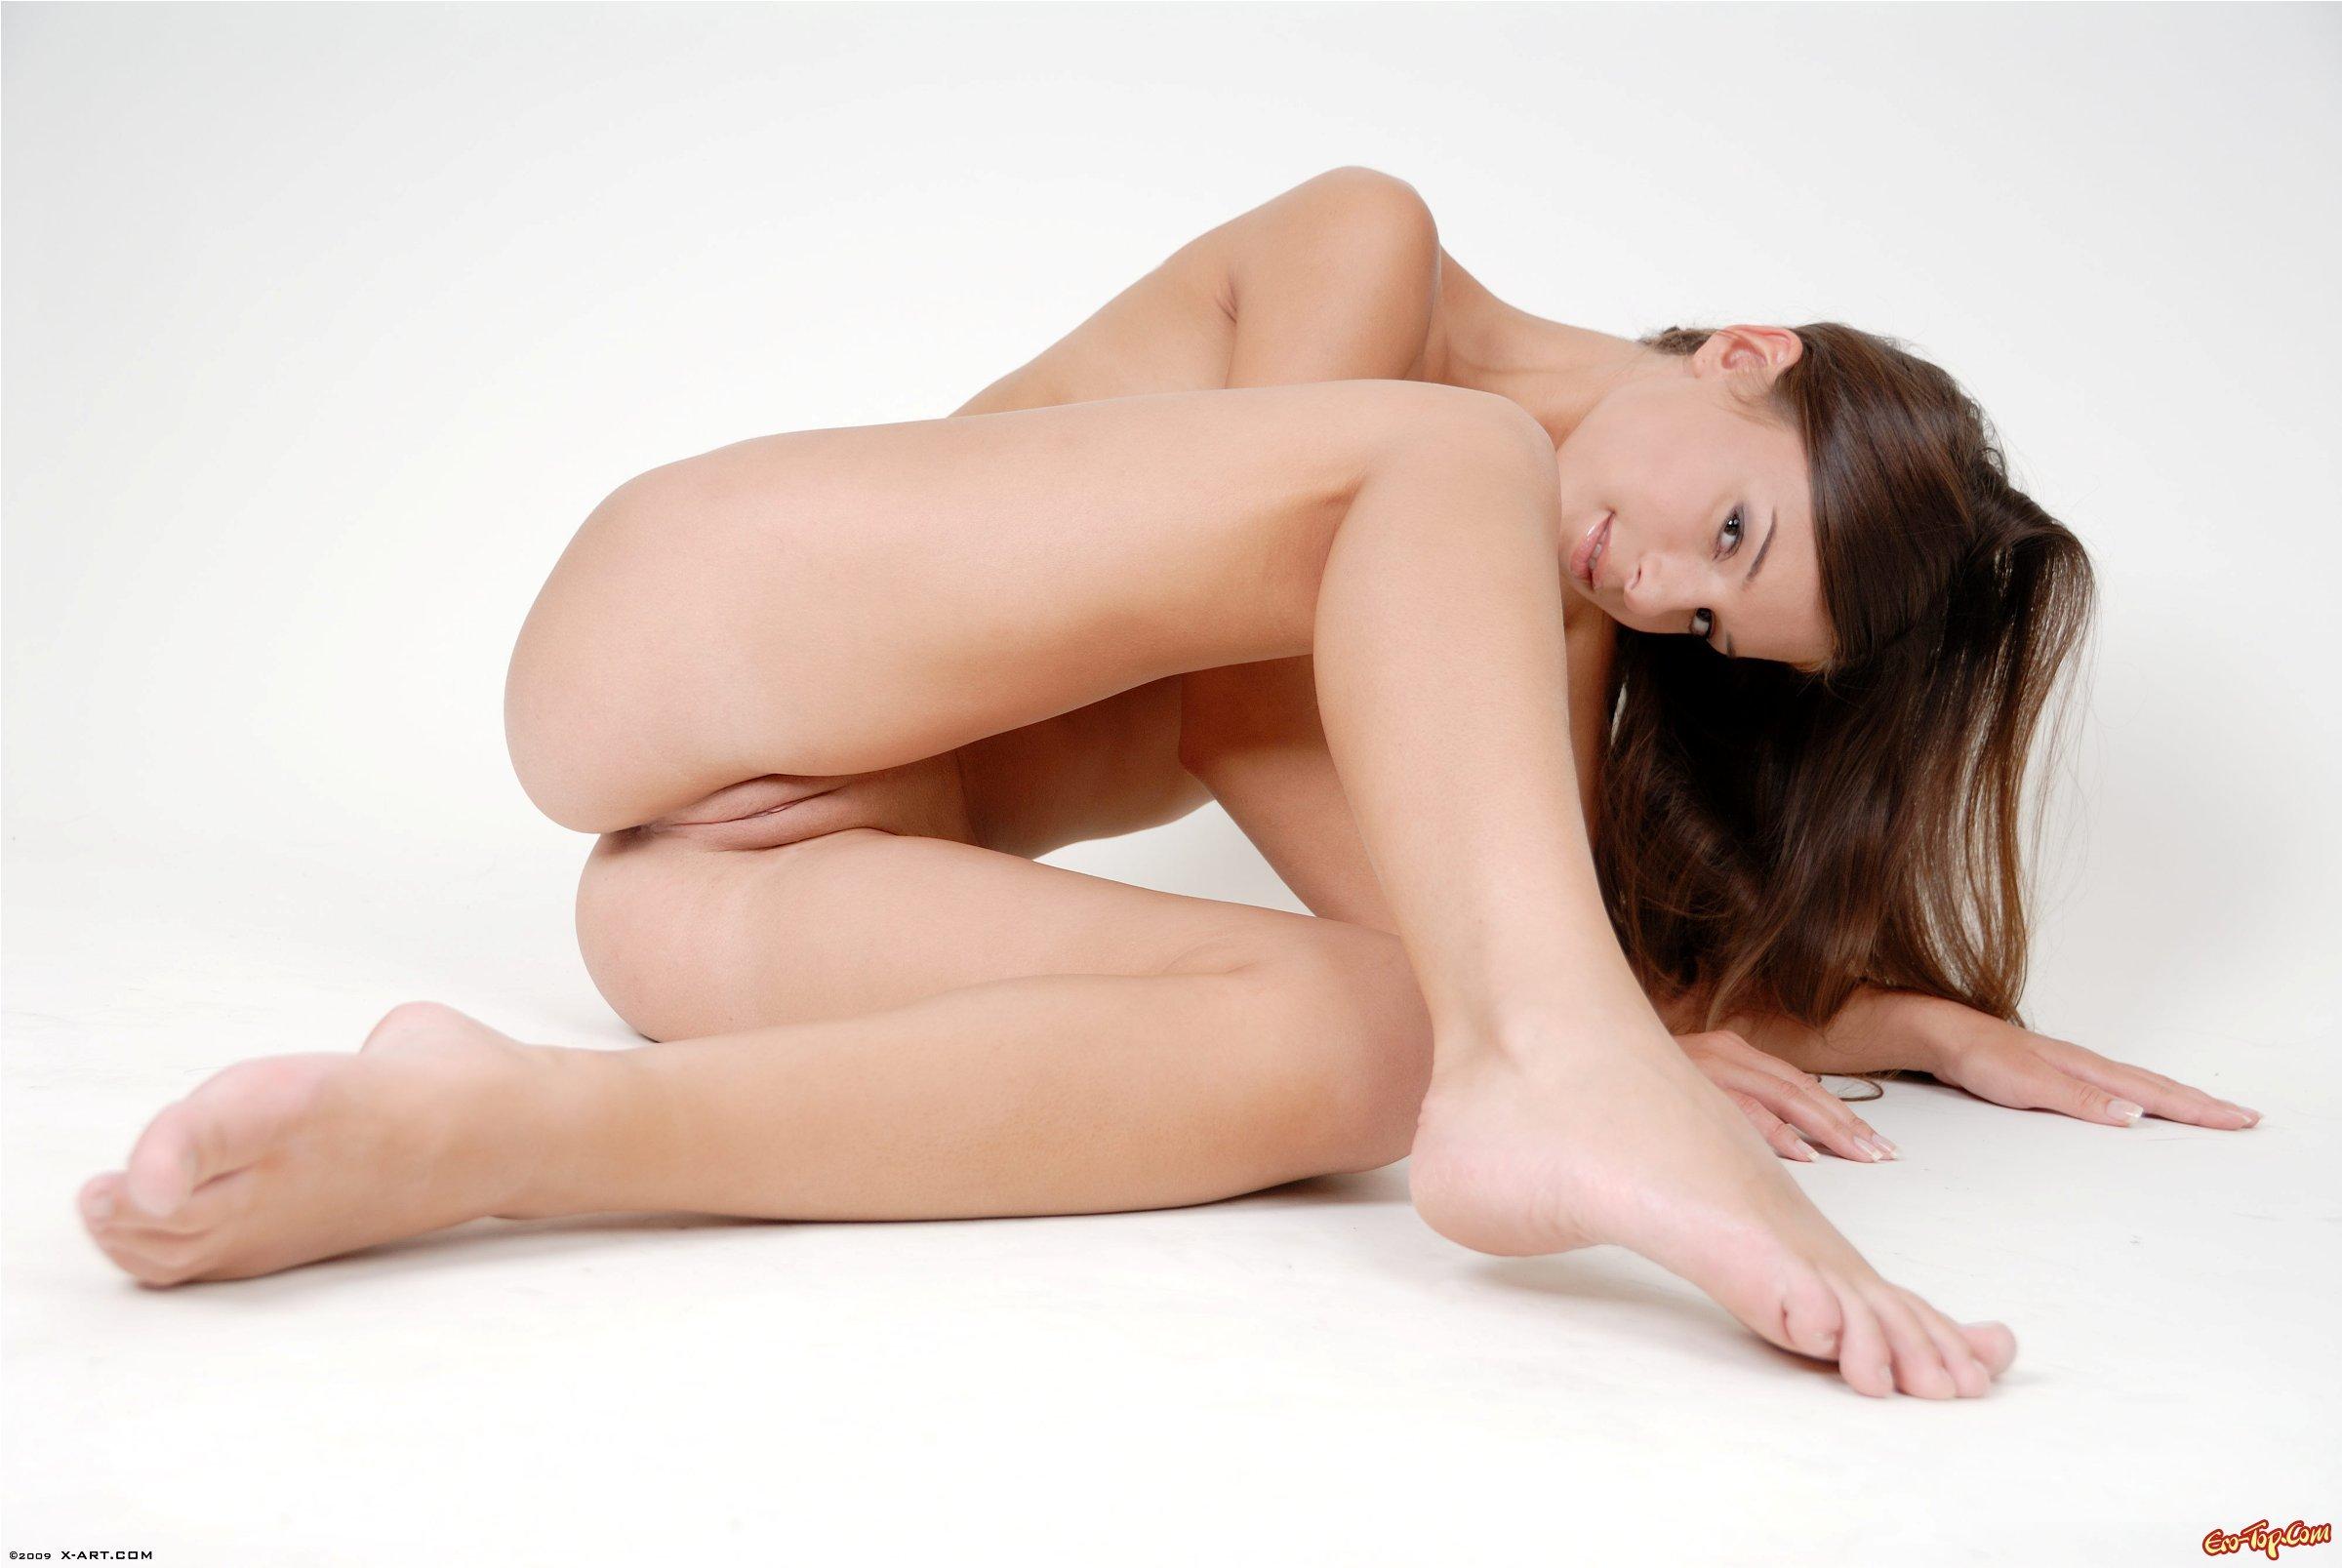 Free little pixie fucks human girl porn fucked pics